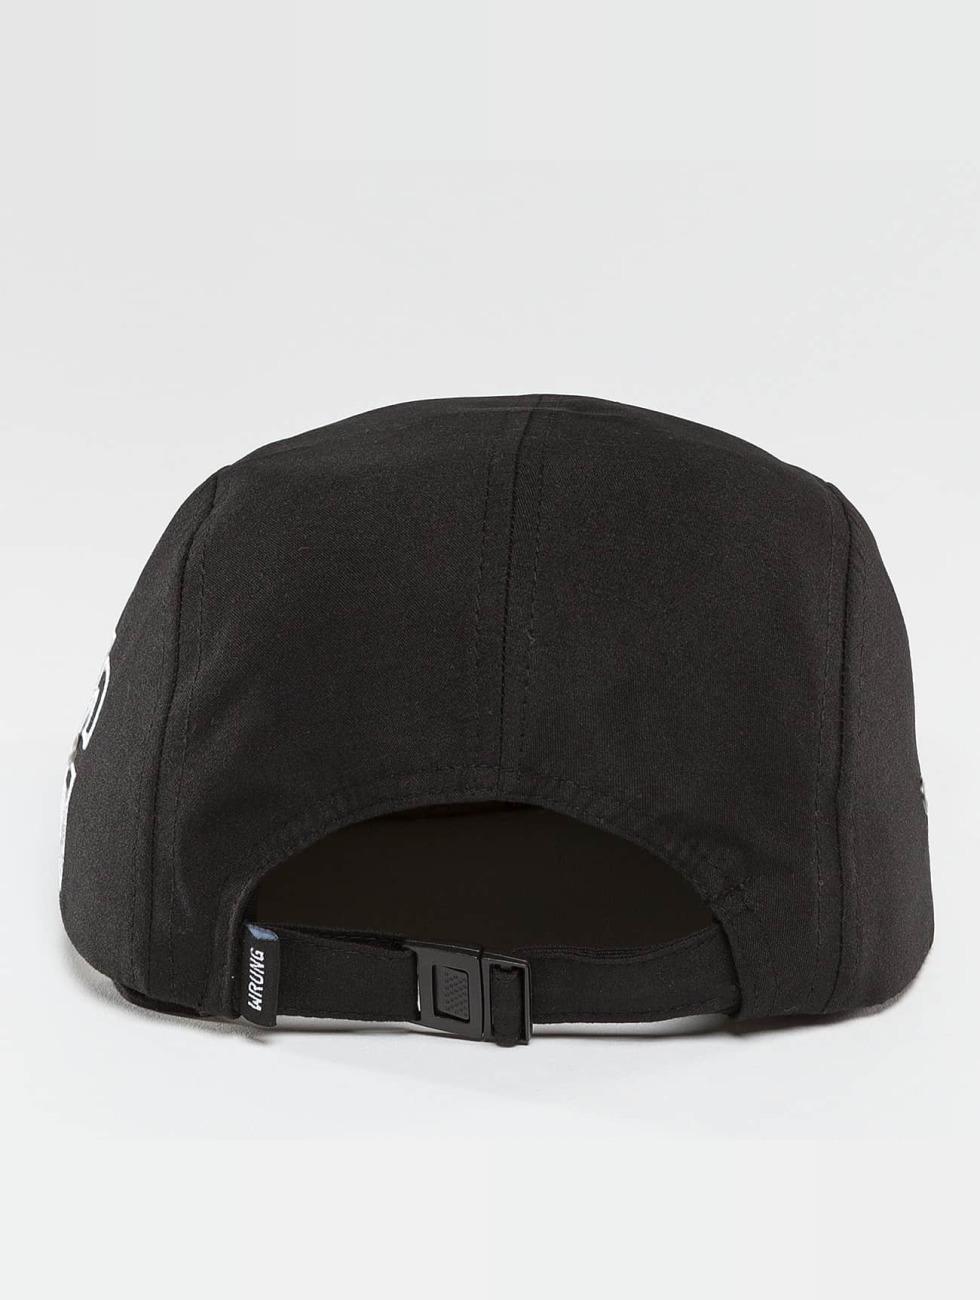 Wrung Division 5 Panel Caps Side schwarz